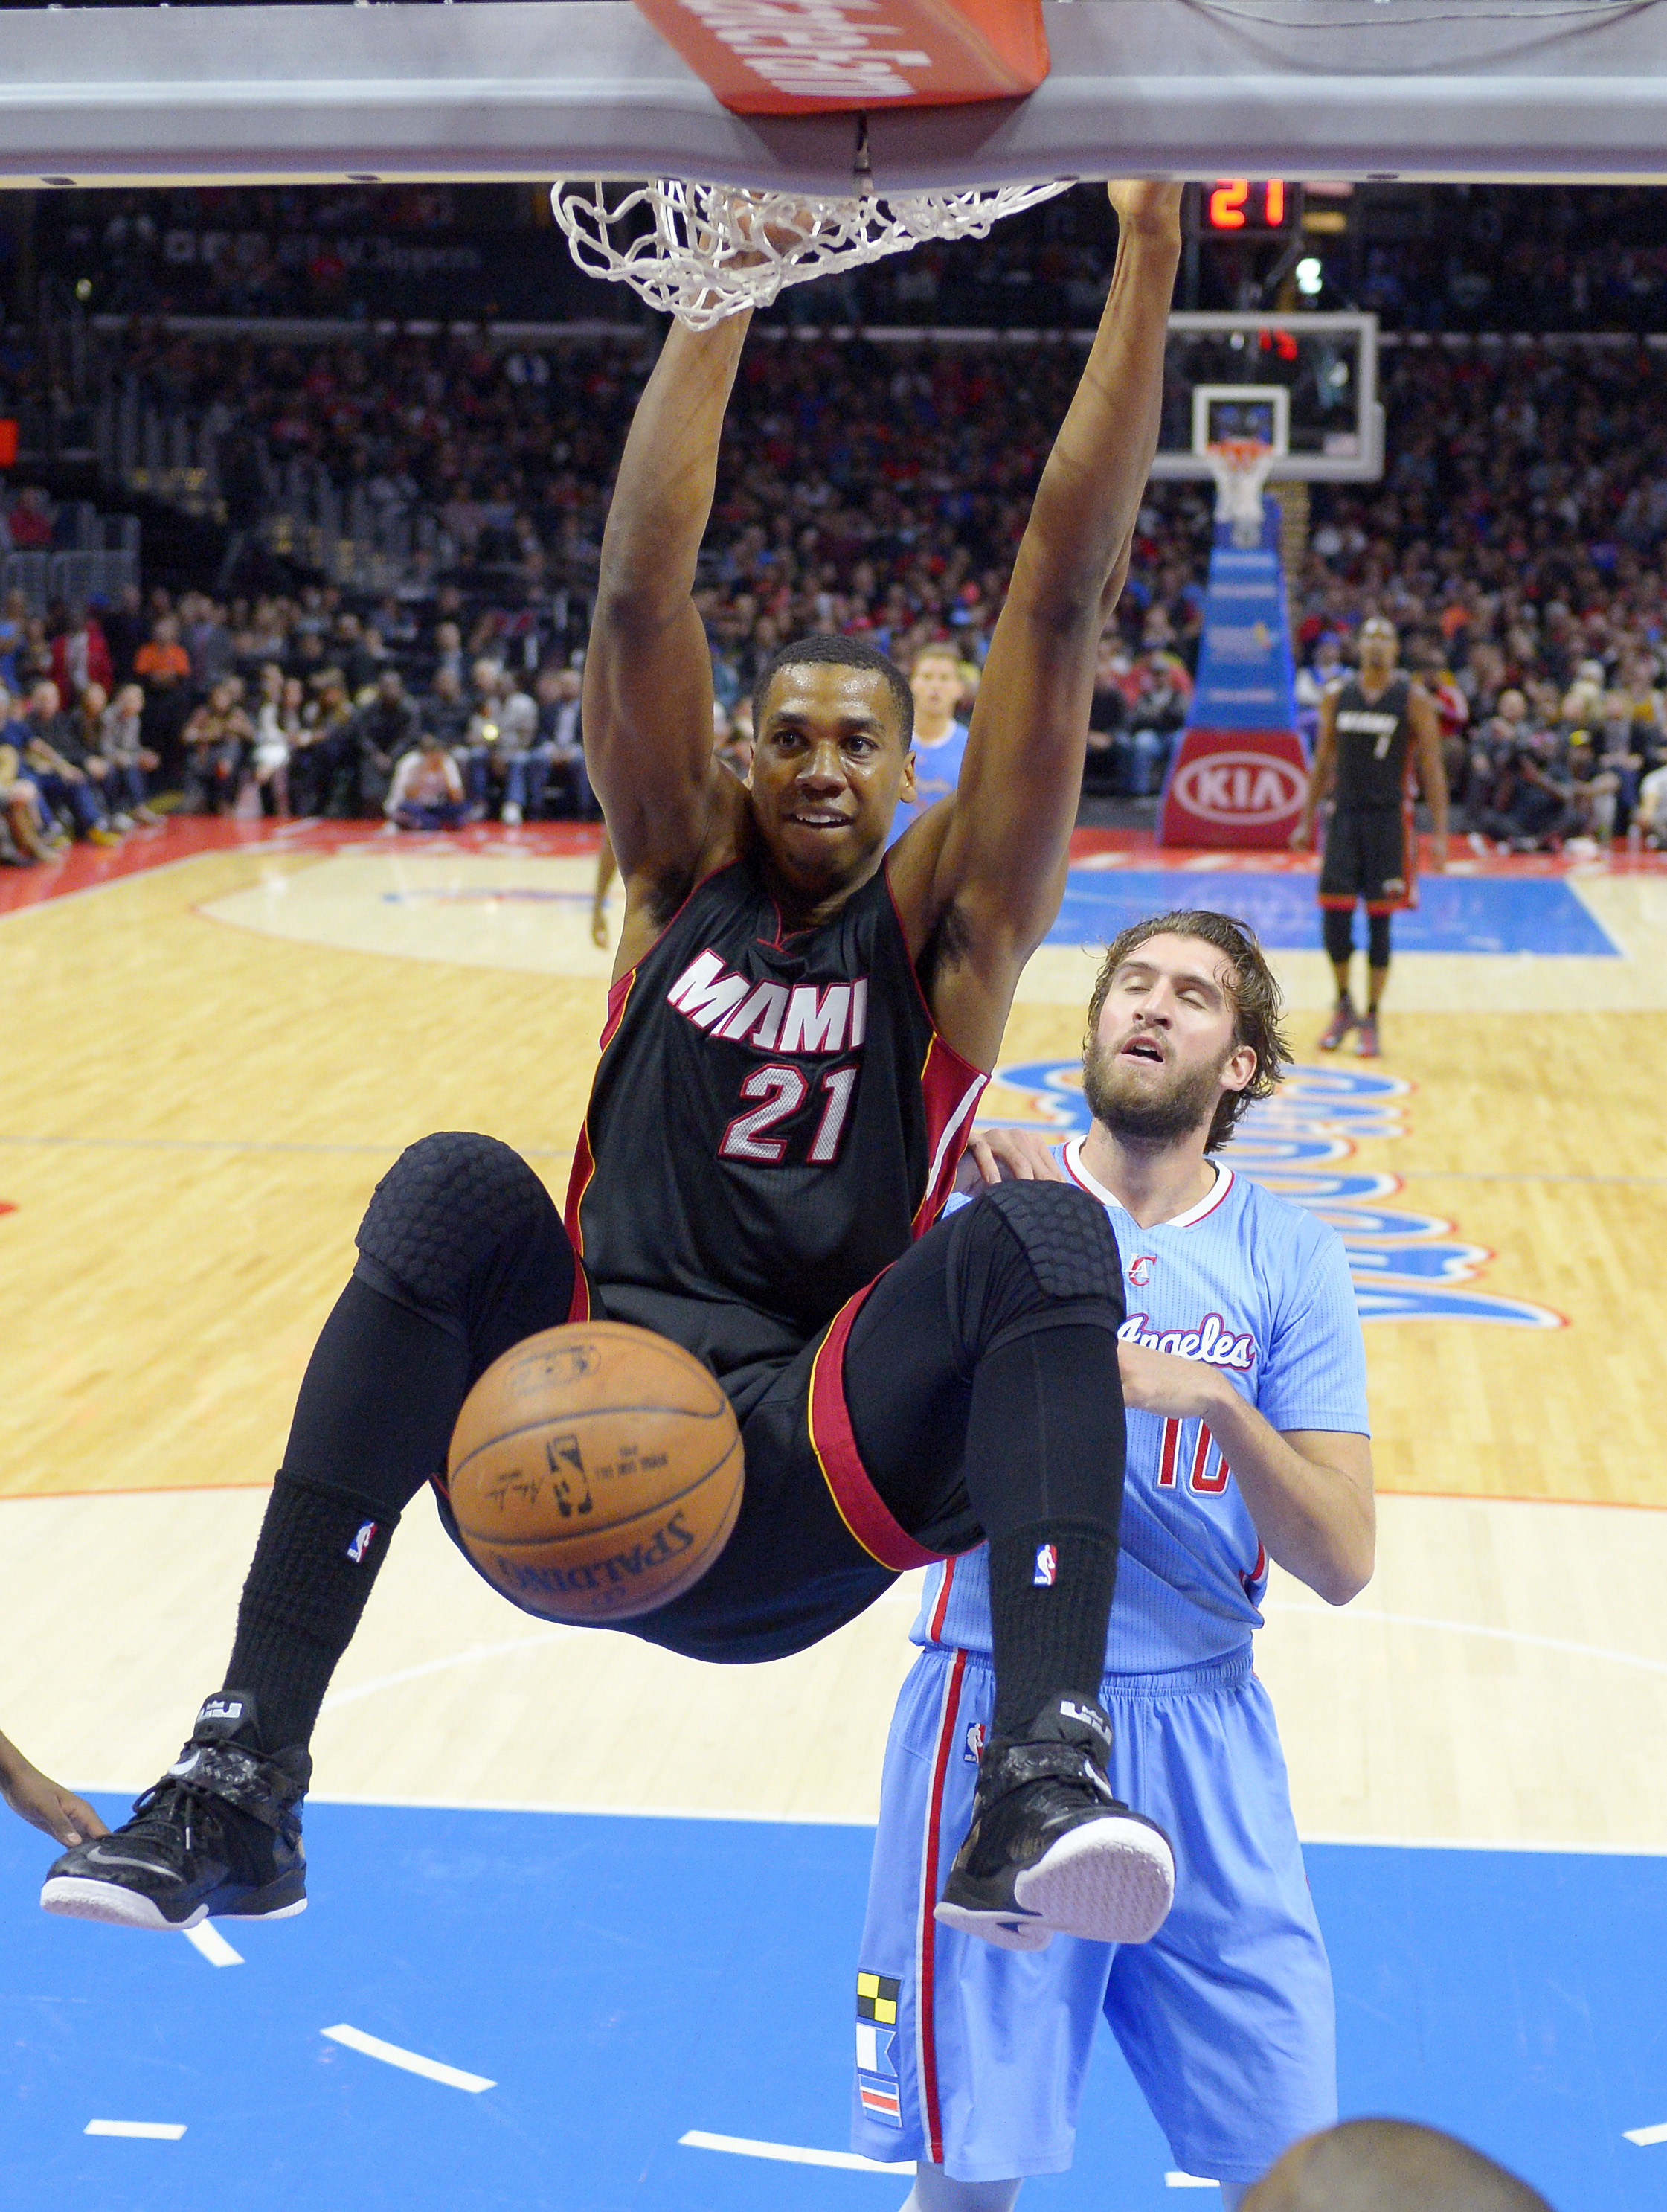 Nba Basketball Miami Heat Bedroom In: Miami Heat News, Rumors: Dwyane Wade, Hassan Whiteside